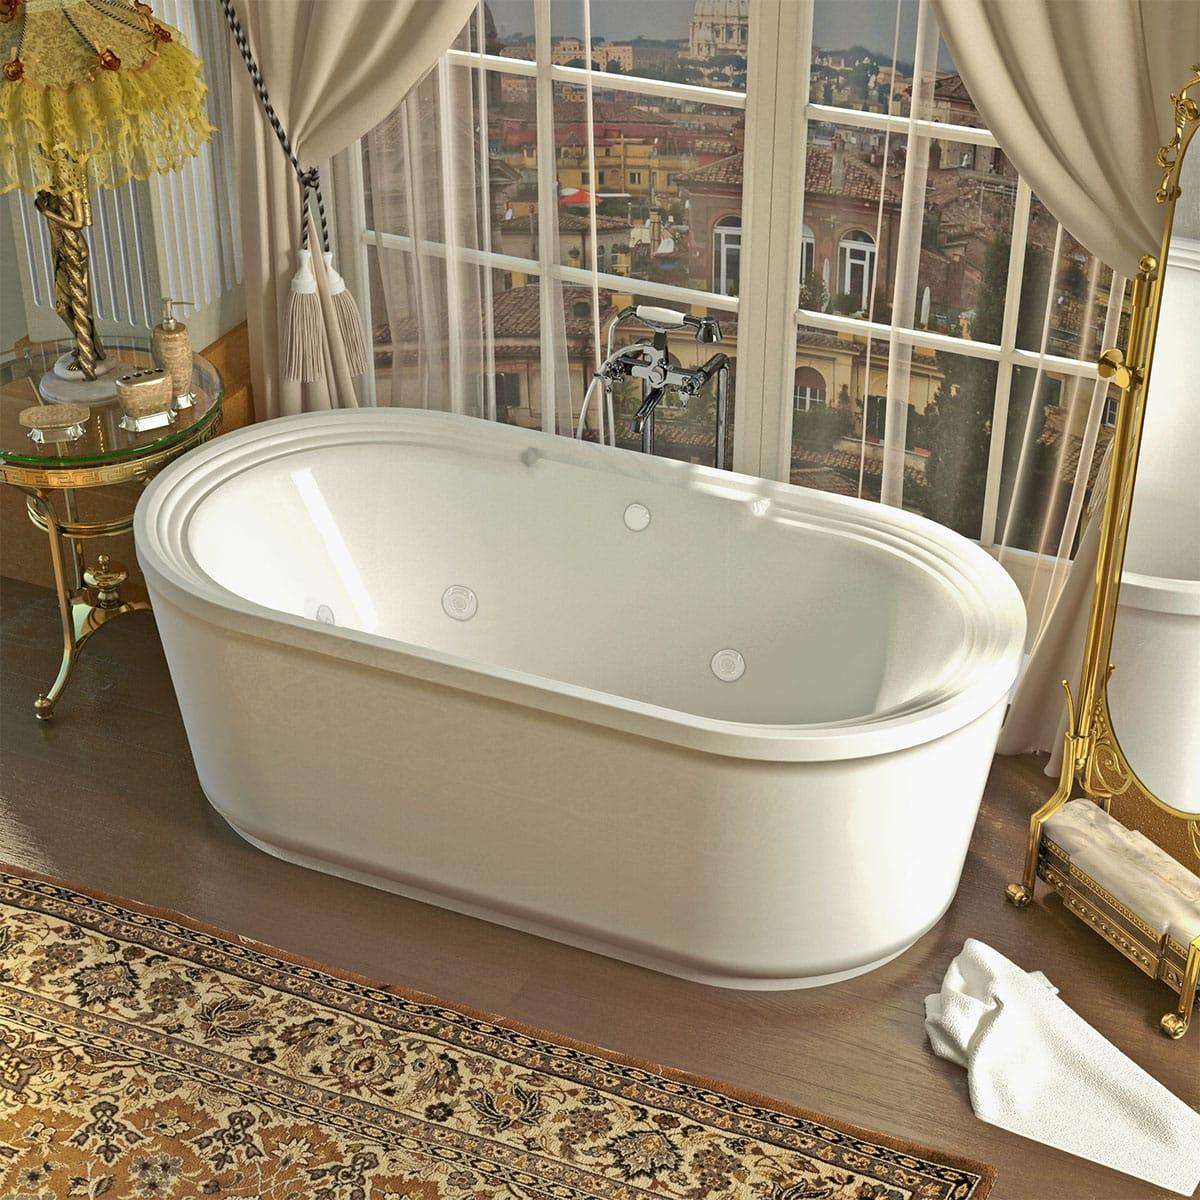 Avano Av3467rd White Fiji 66 7 8 Acrylic Air Whirlpool Bathtub For Freestanding Installations With Center Drain Faucet Com